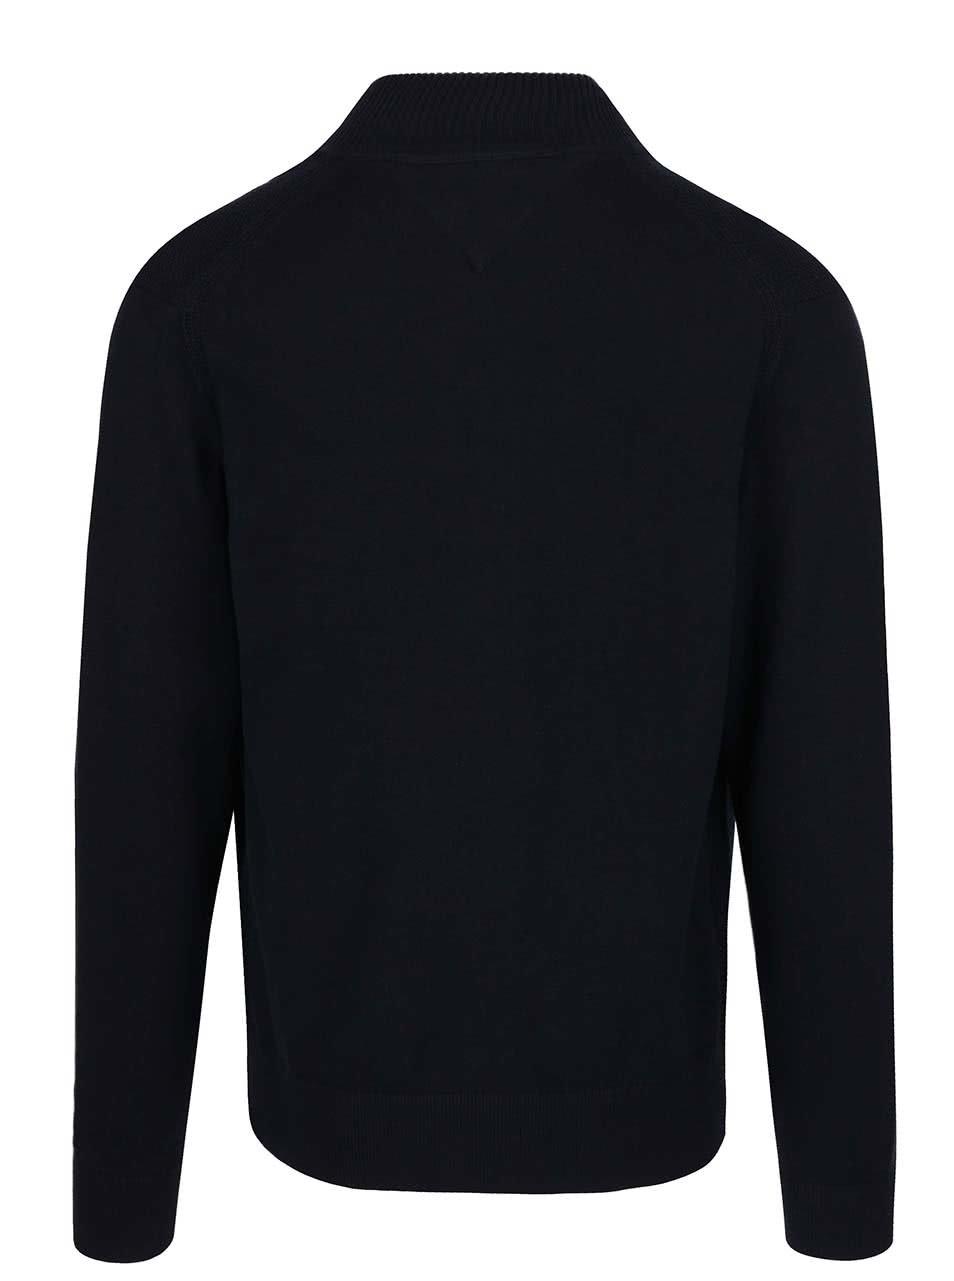 Tmavě modrý pánský svetr na zip Tommy Hilfiger ... 0af0ebca74